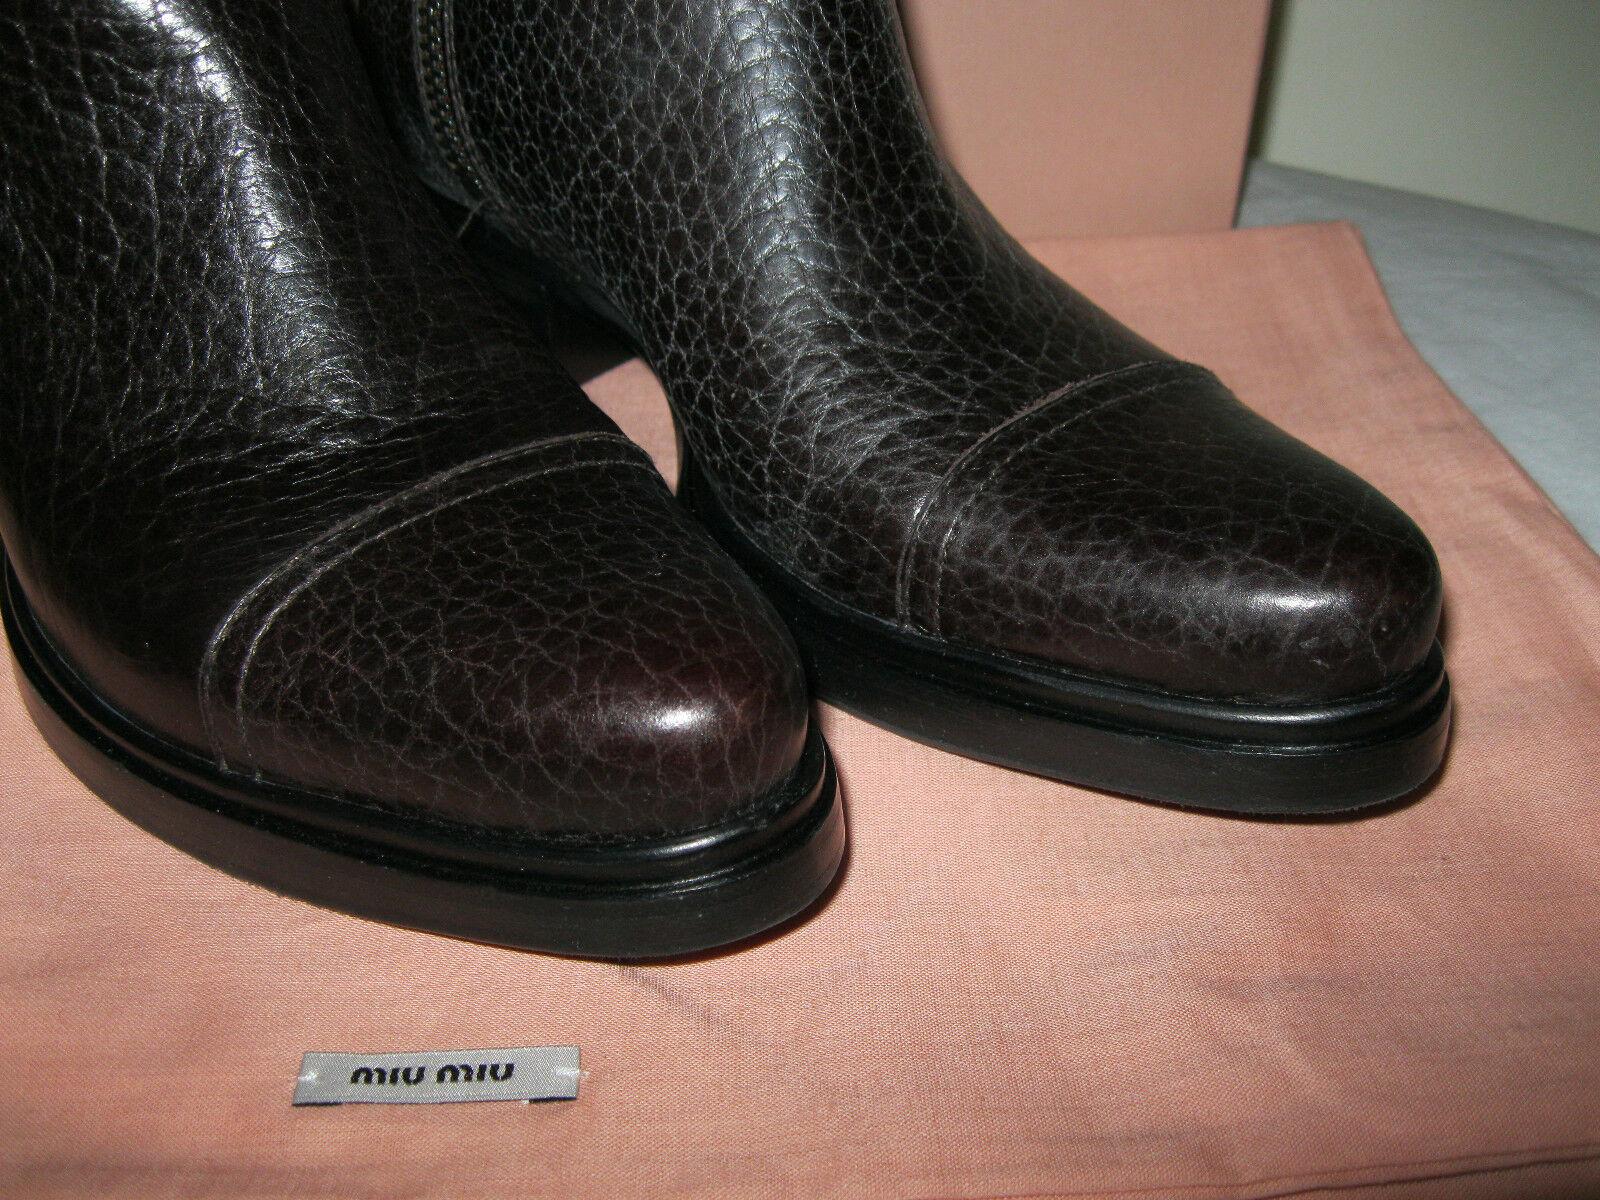 Miu miu miu miu by PRADA botas, Nuevo, Tamaño 36.5 0c27d4